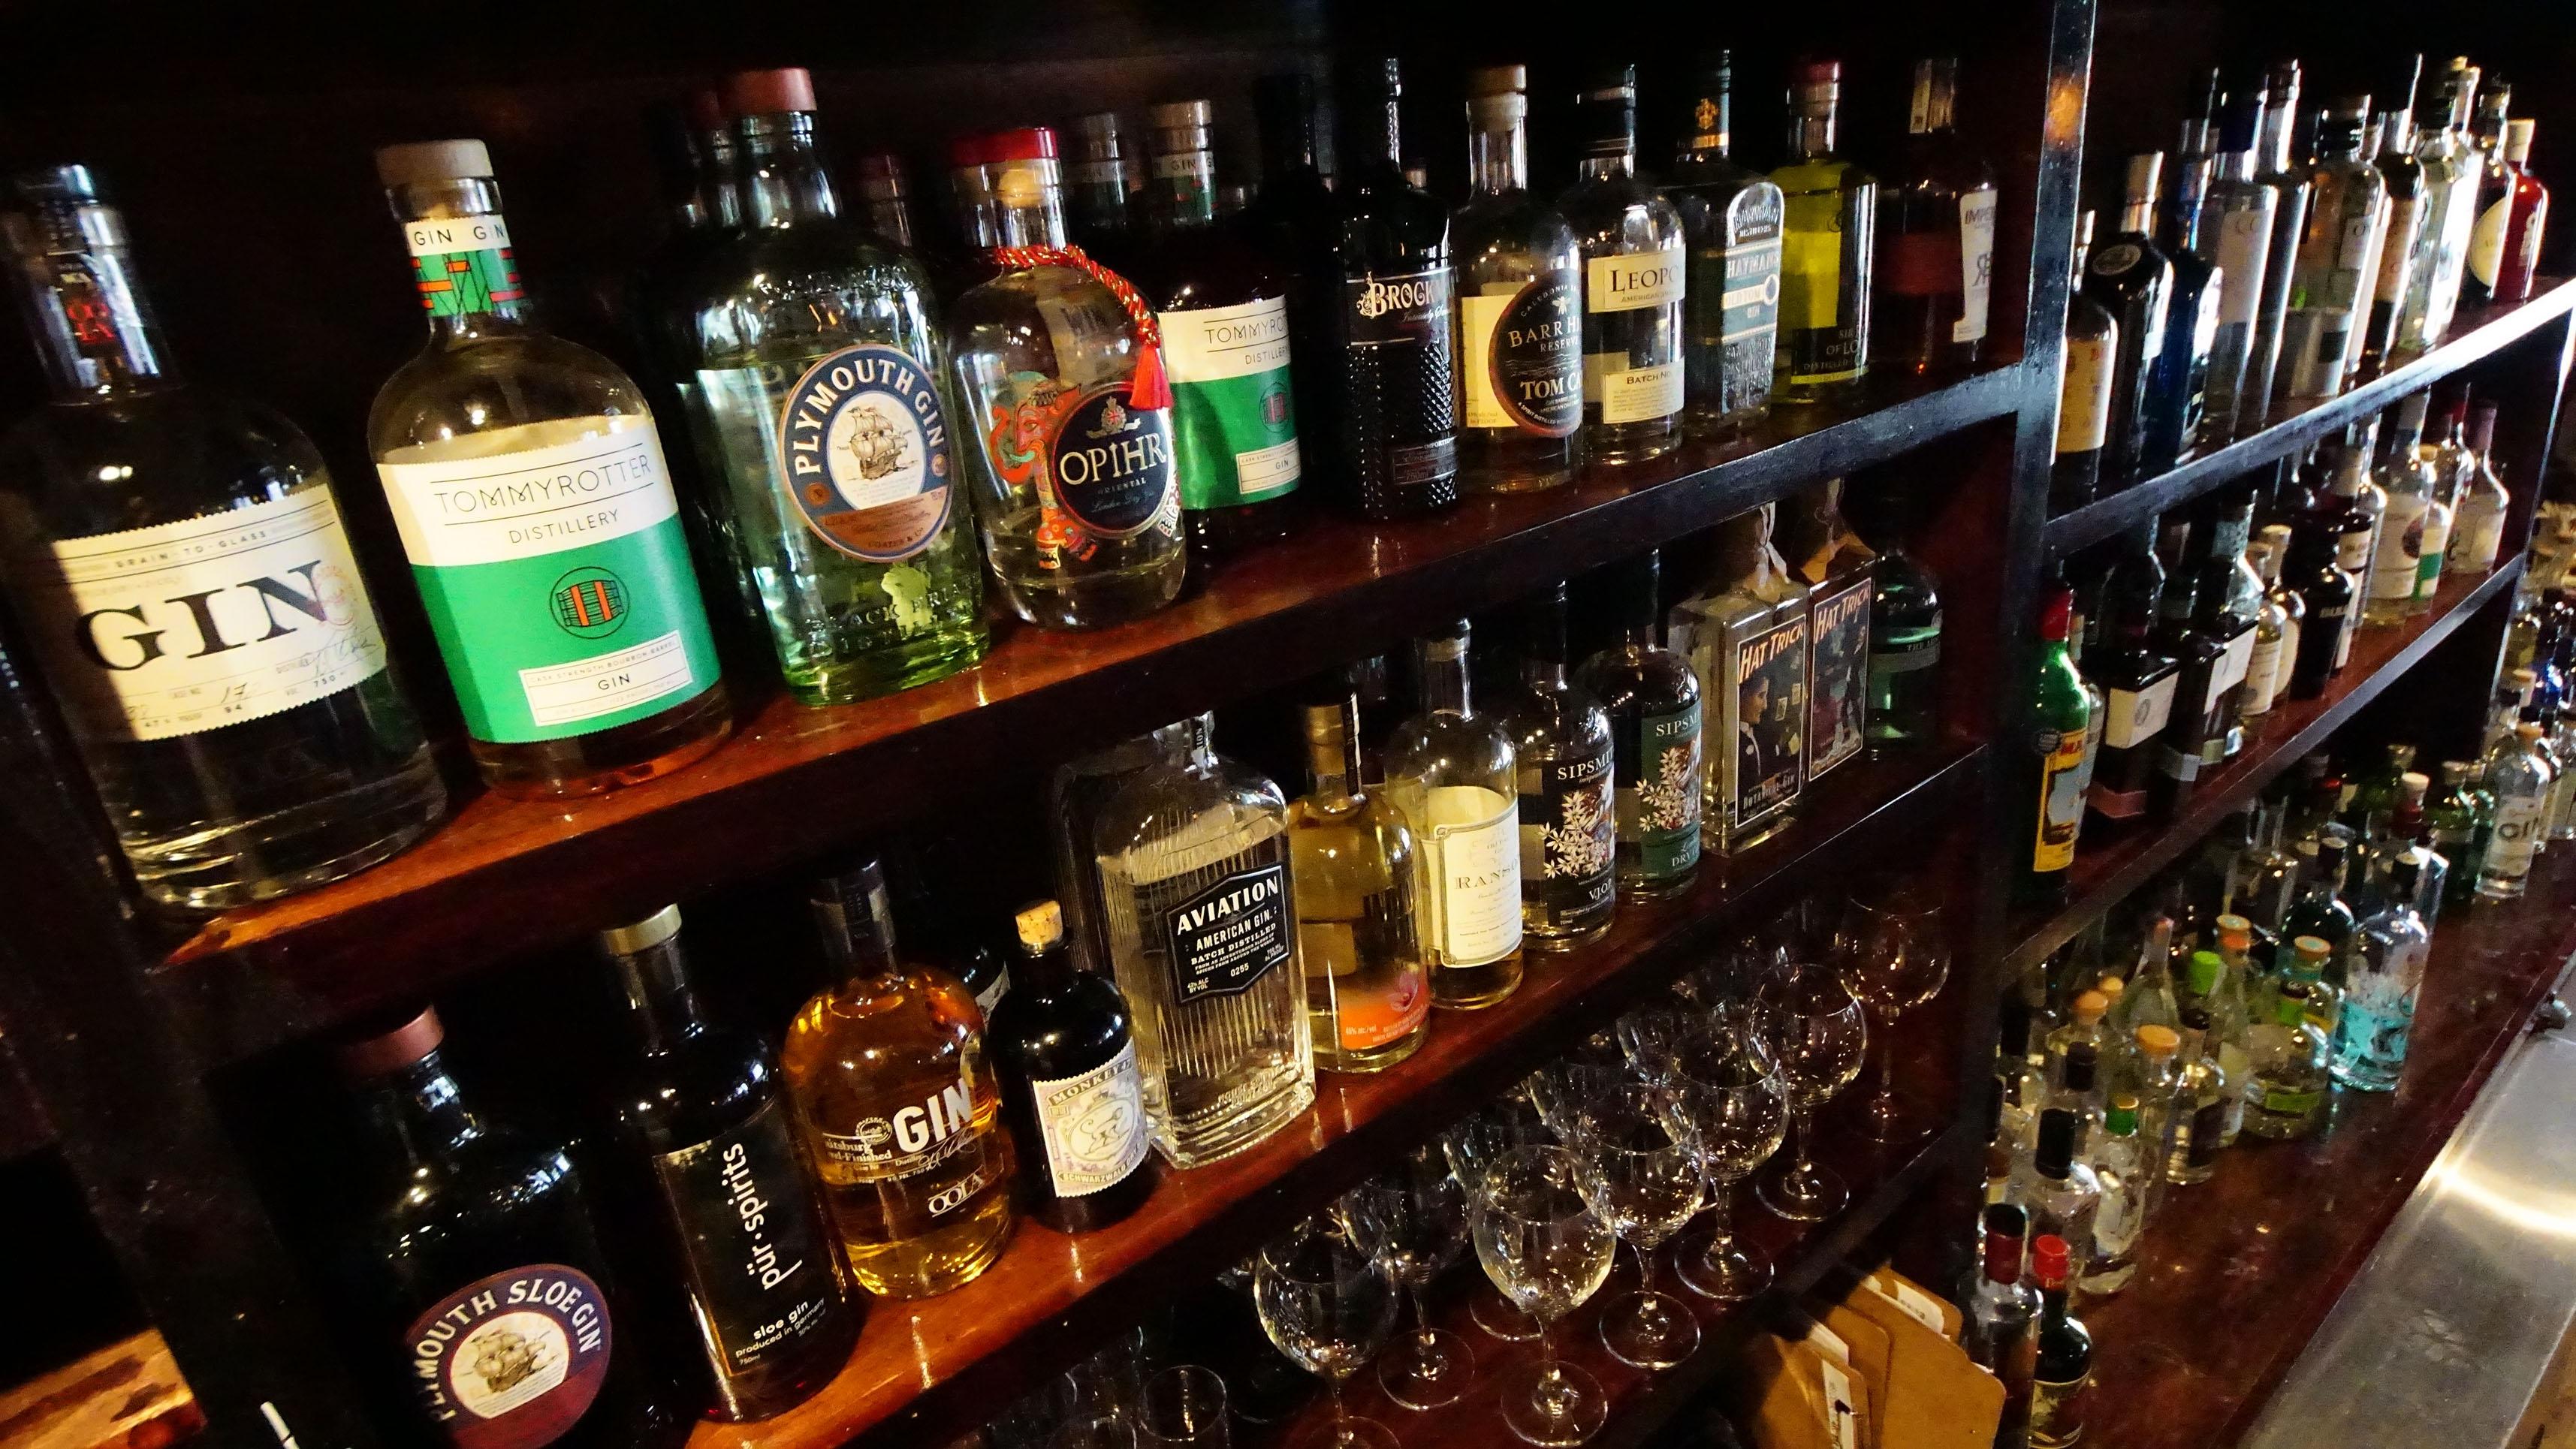 The 'gintoneria' At Aro Bar De Tapas Celebrates Gin Tonics photo